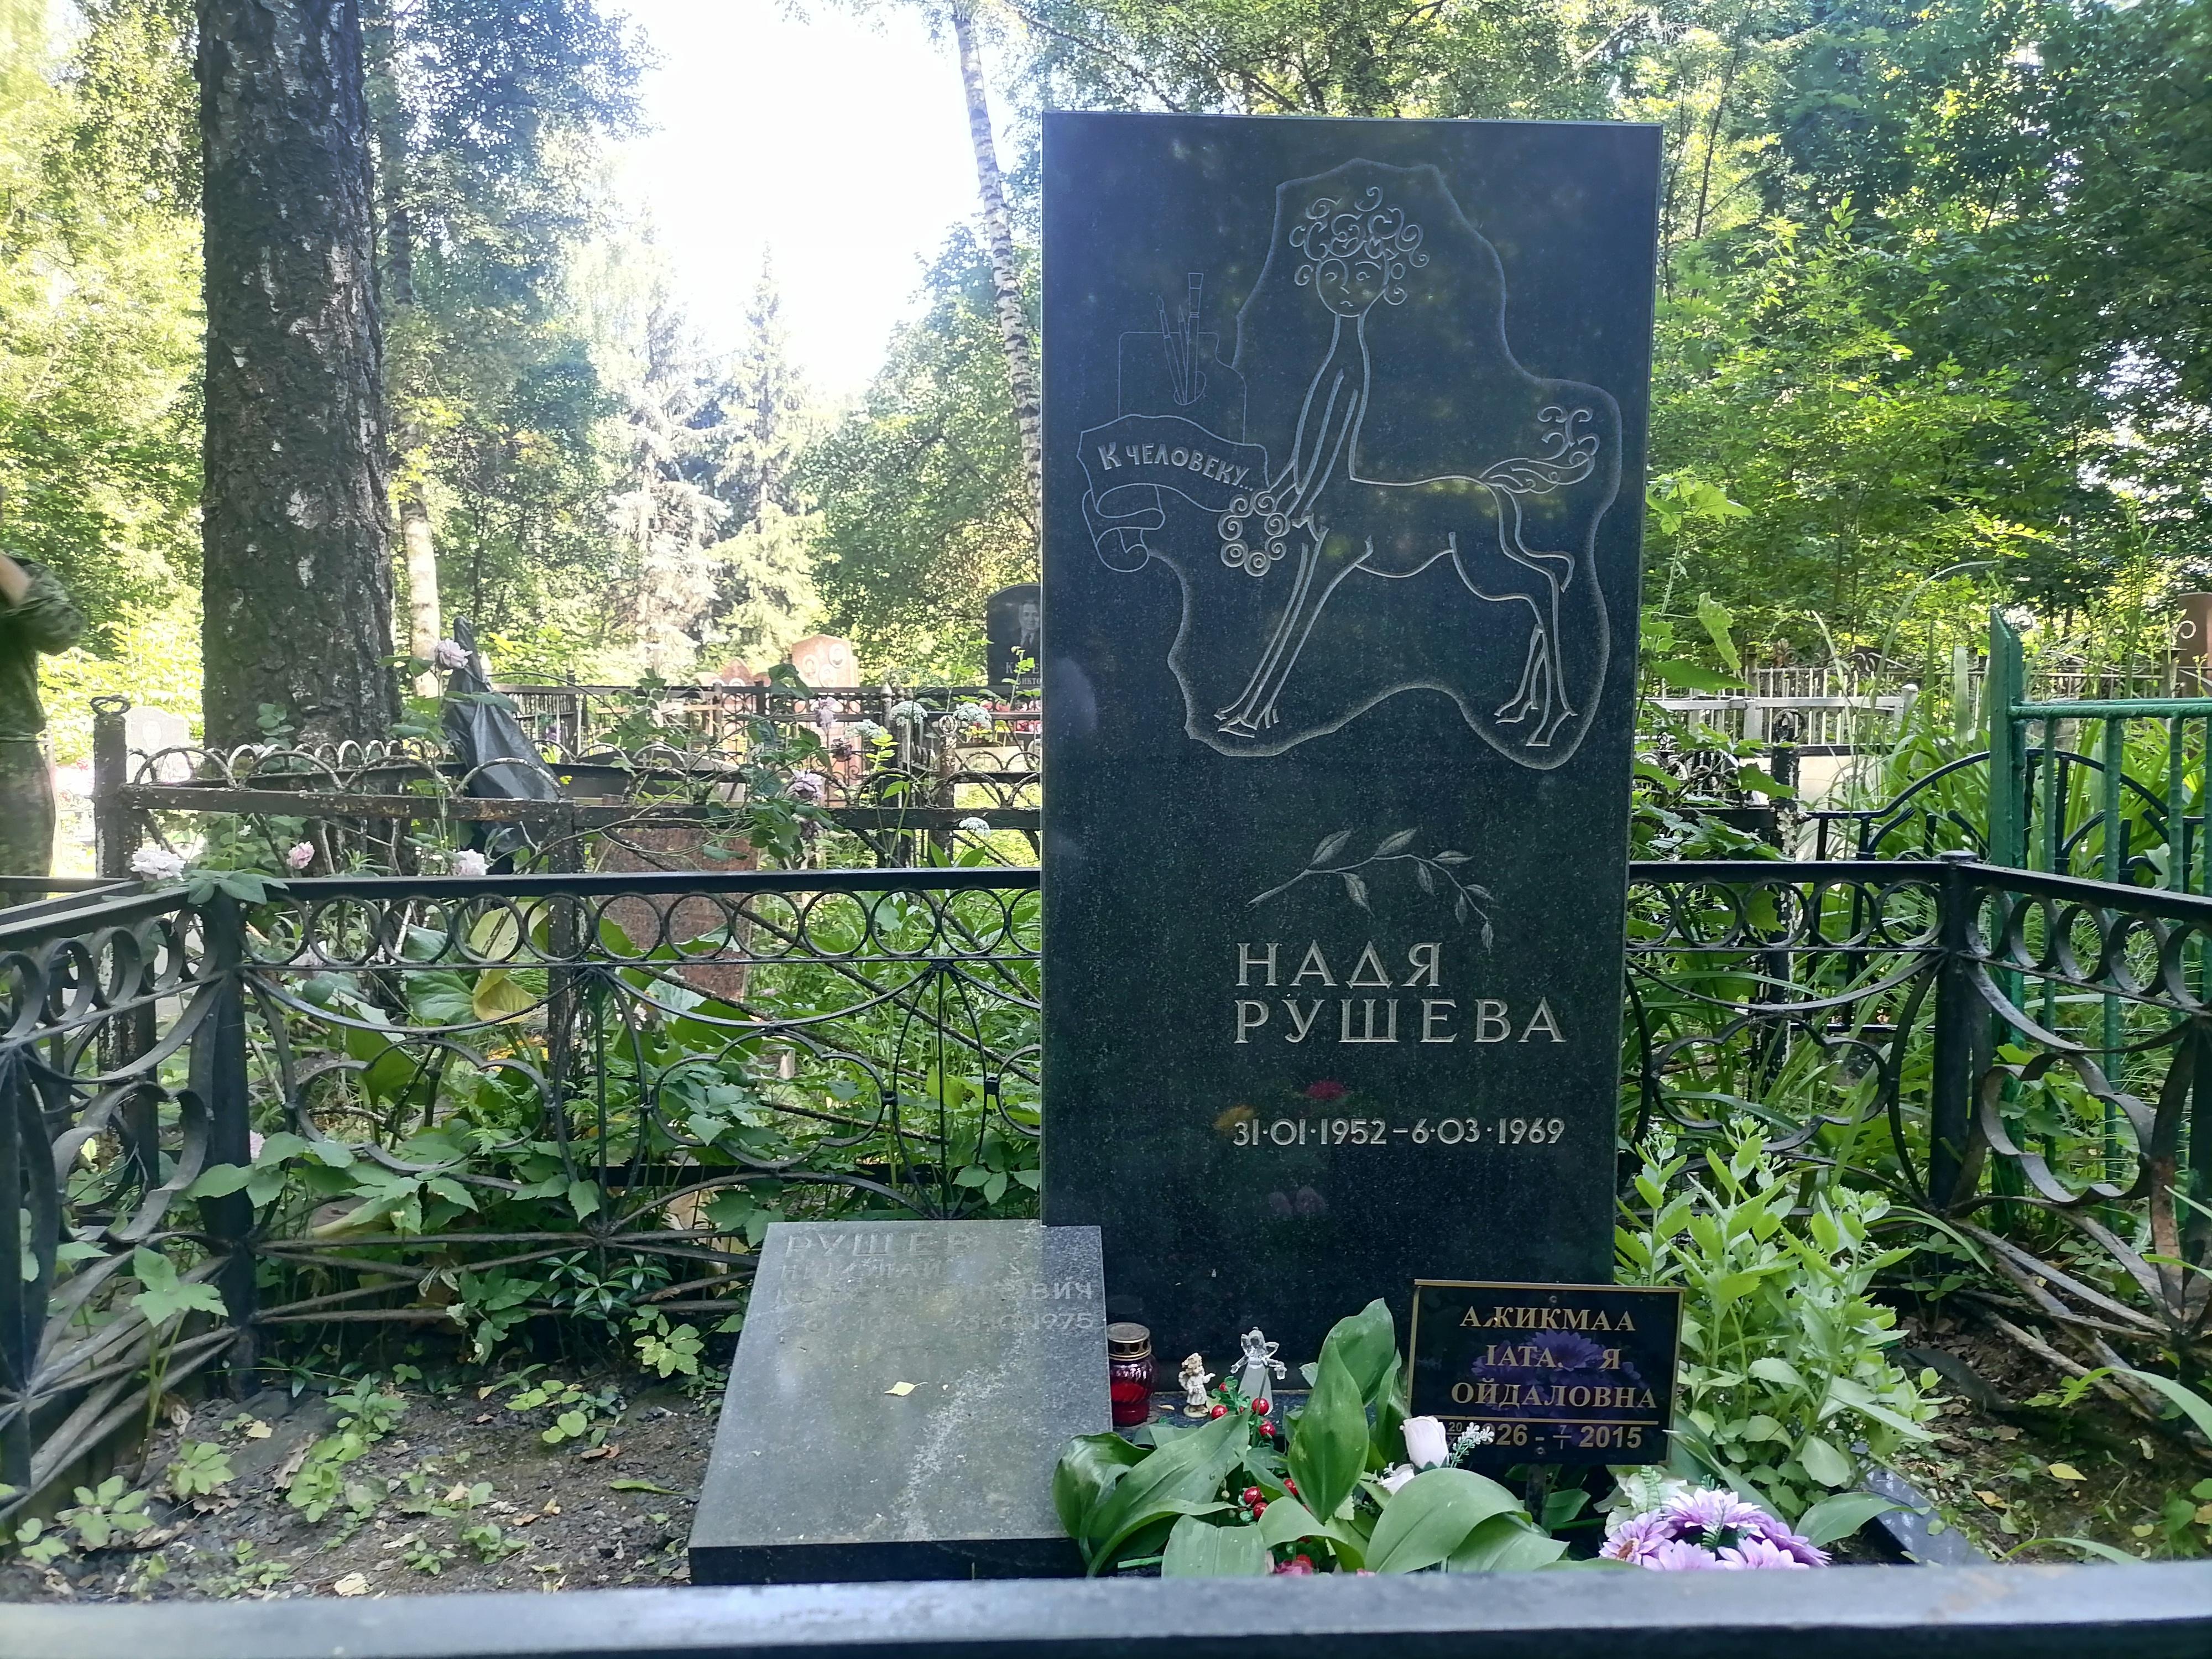 http://upload.wikimedia.org/wikipedia/commons/d/d3/Pokrov037.jpg